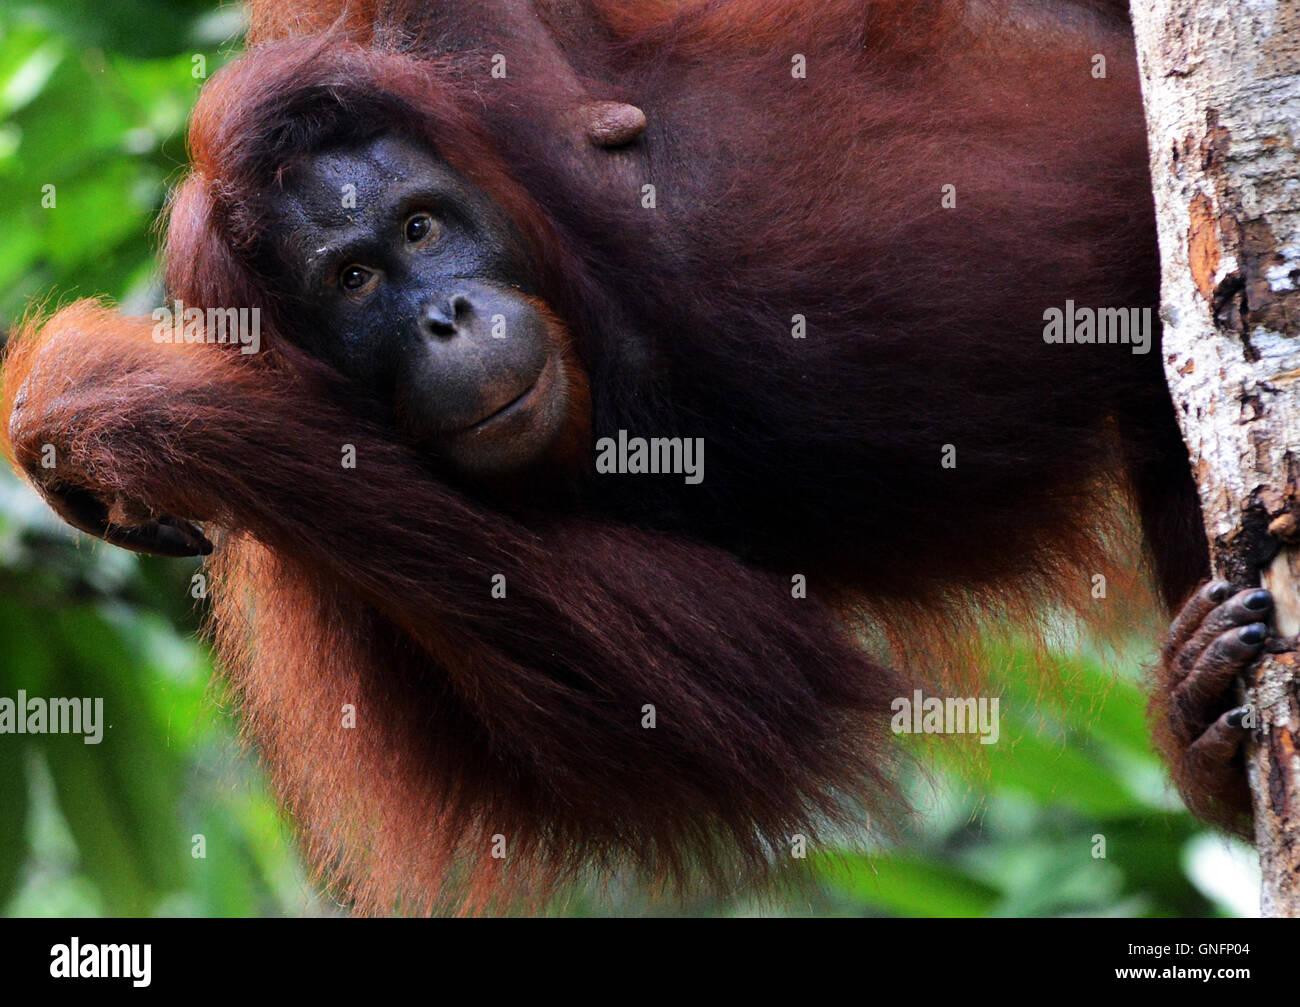 A female Orangutan in Semenggoh nature reserve near Kuching in Sarawak. - Stock Image